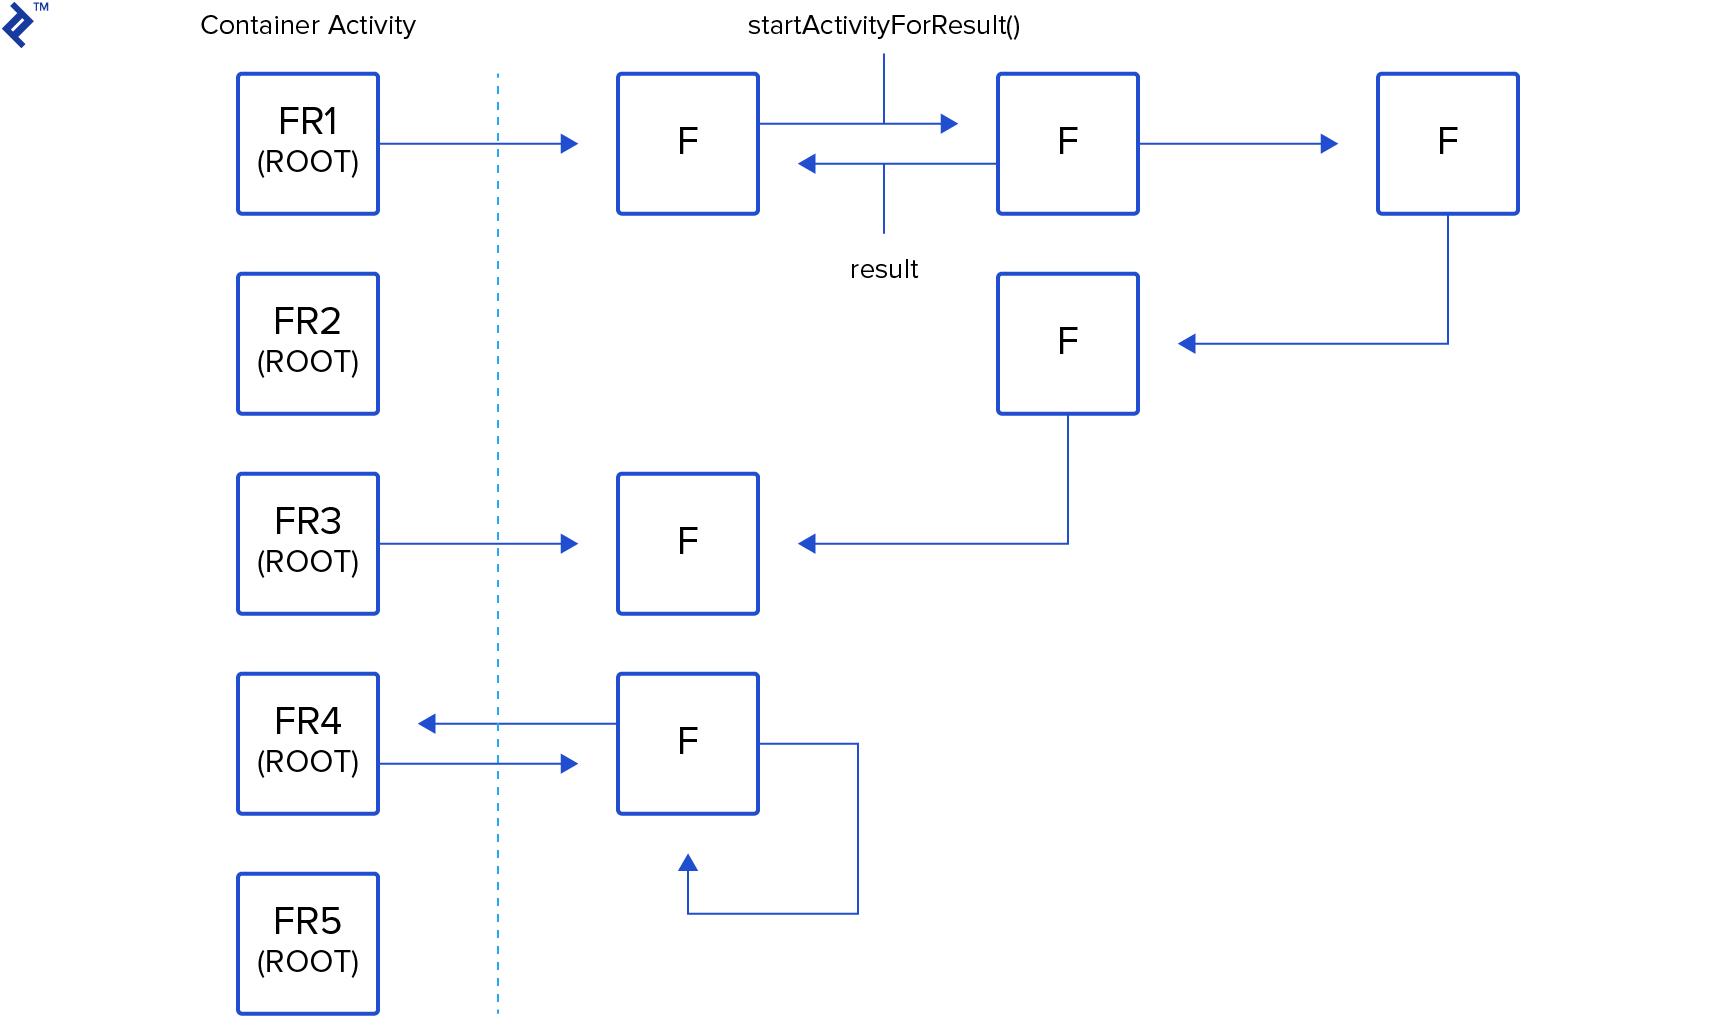 Framgnet image 4